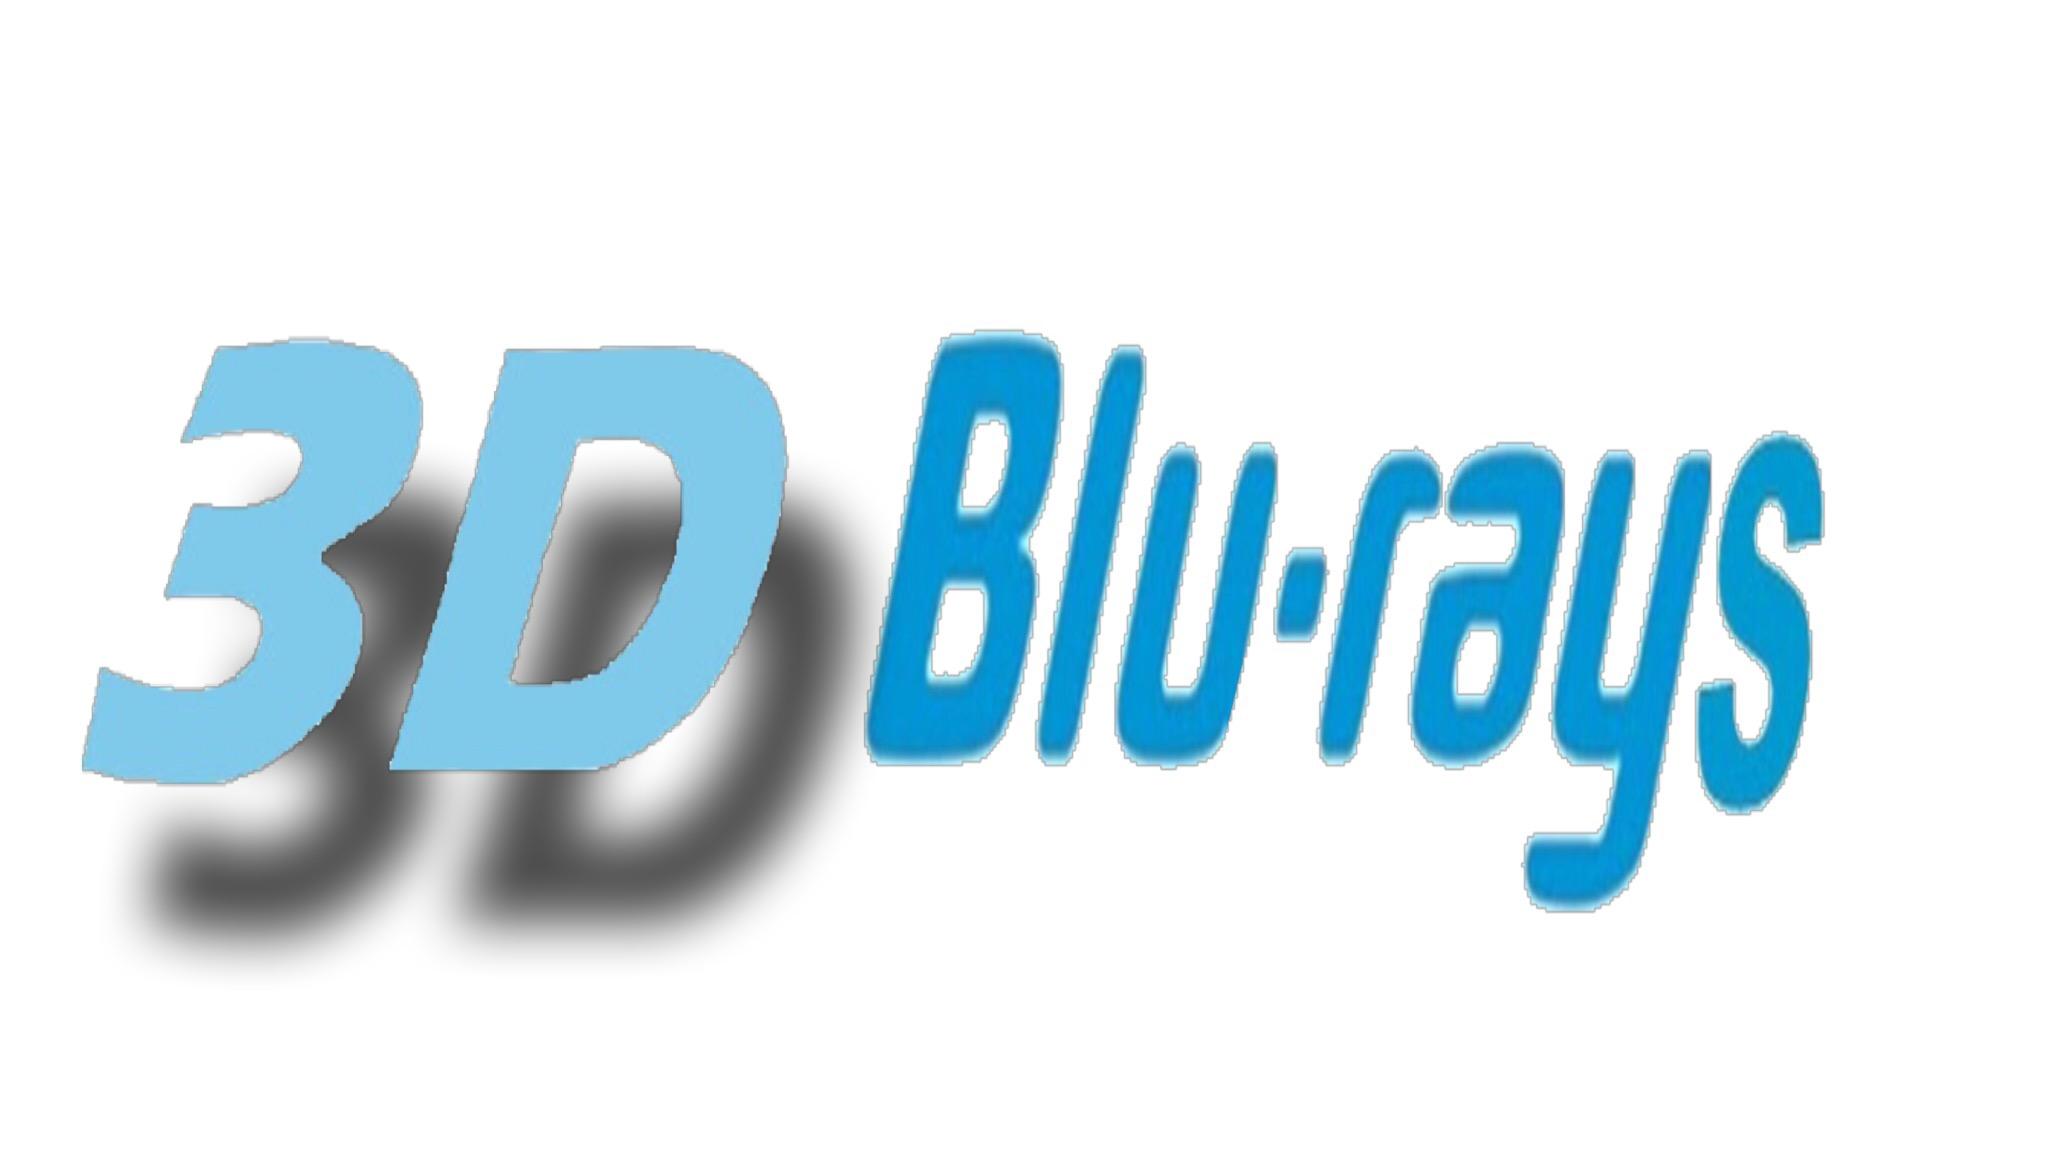 3-D-blu-ray.JPG